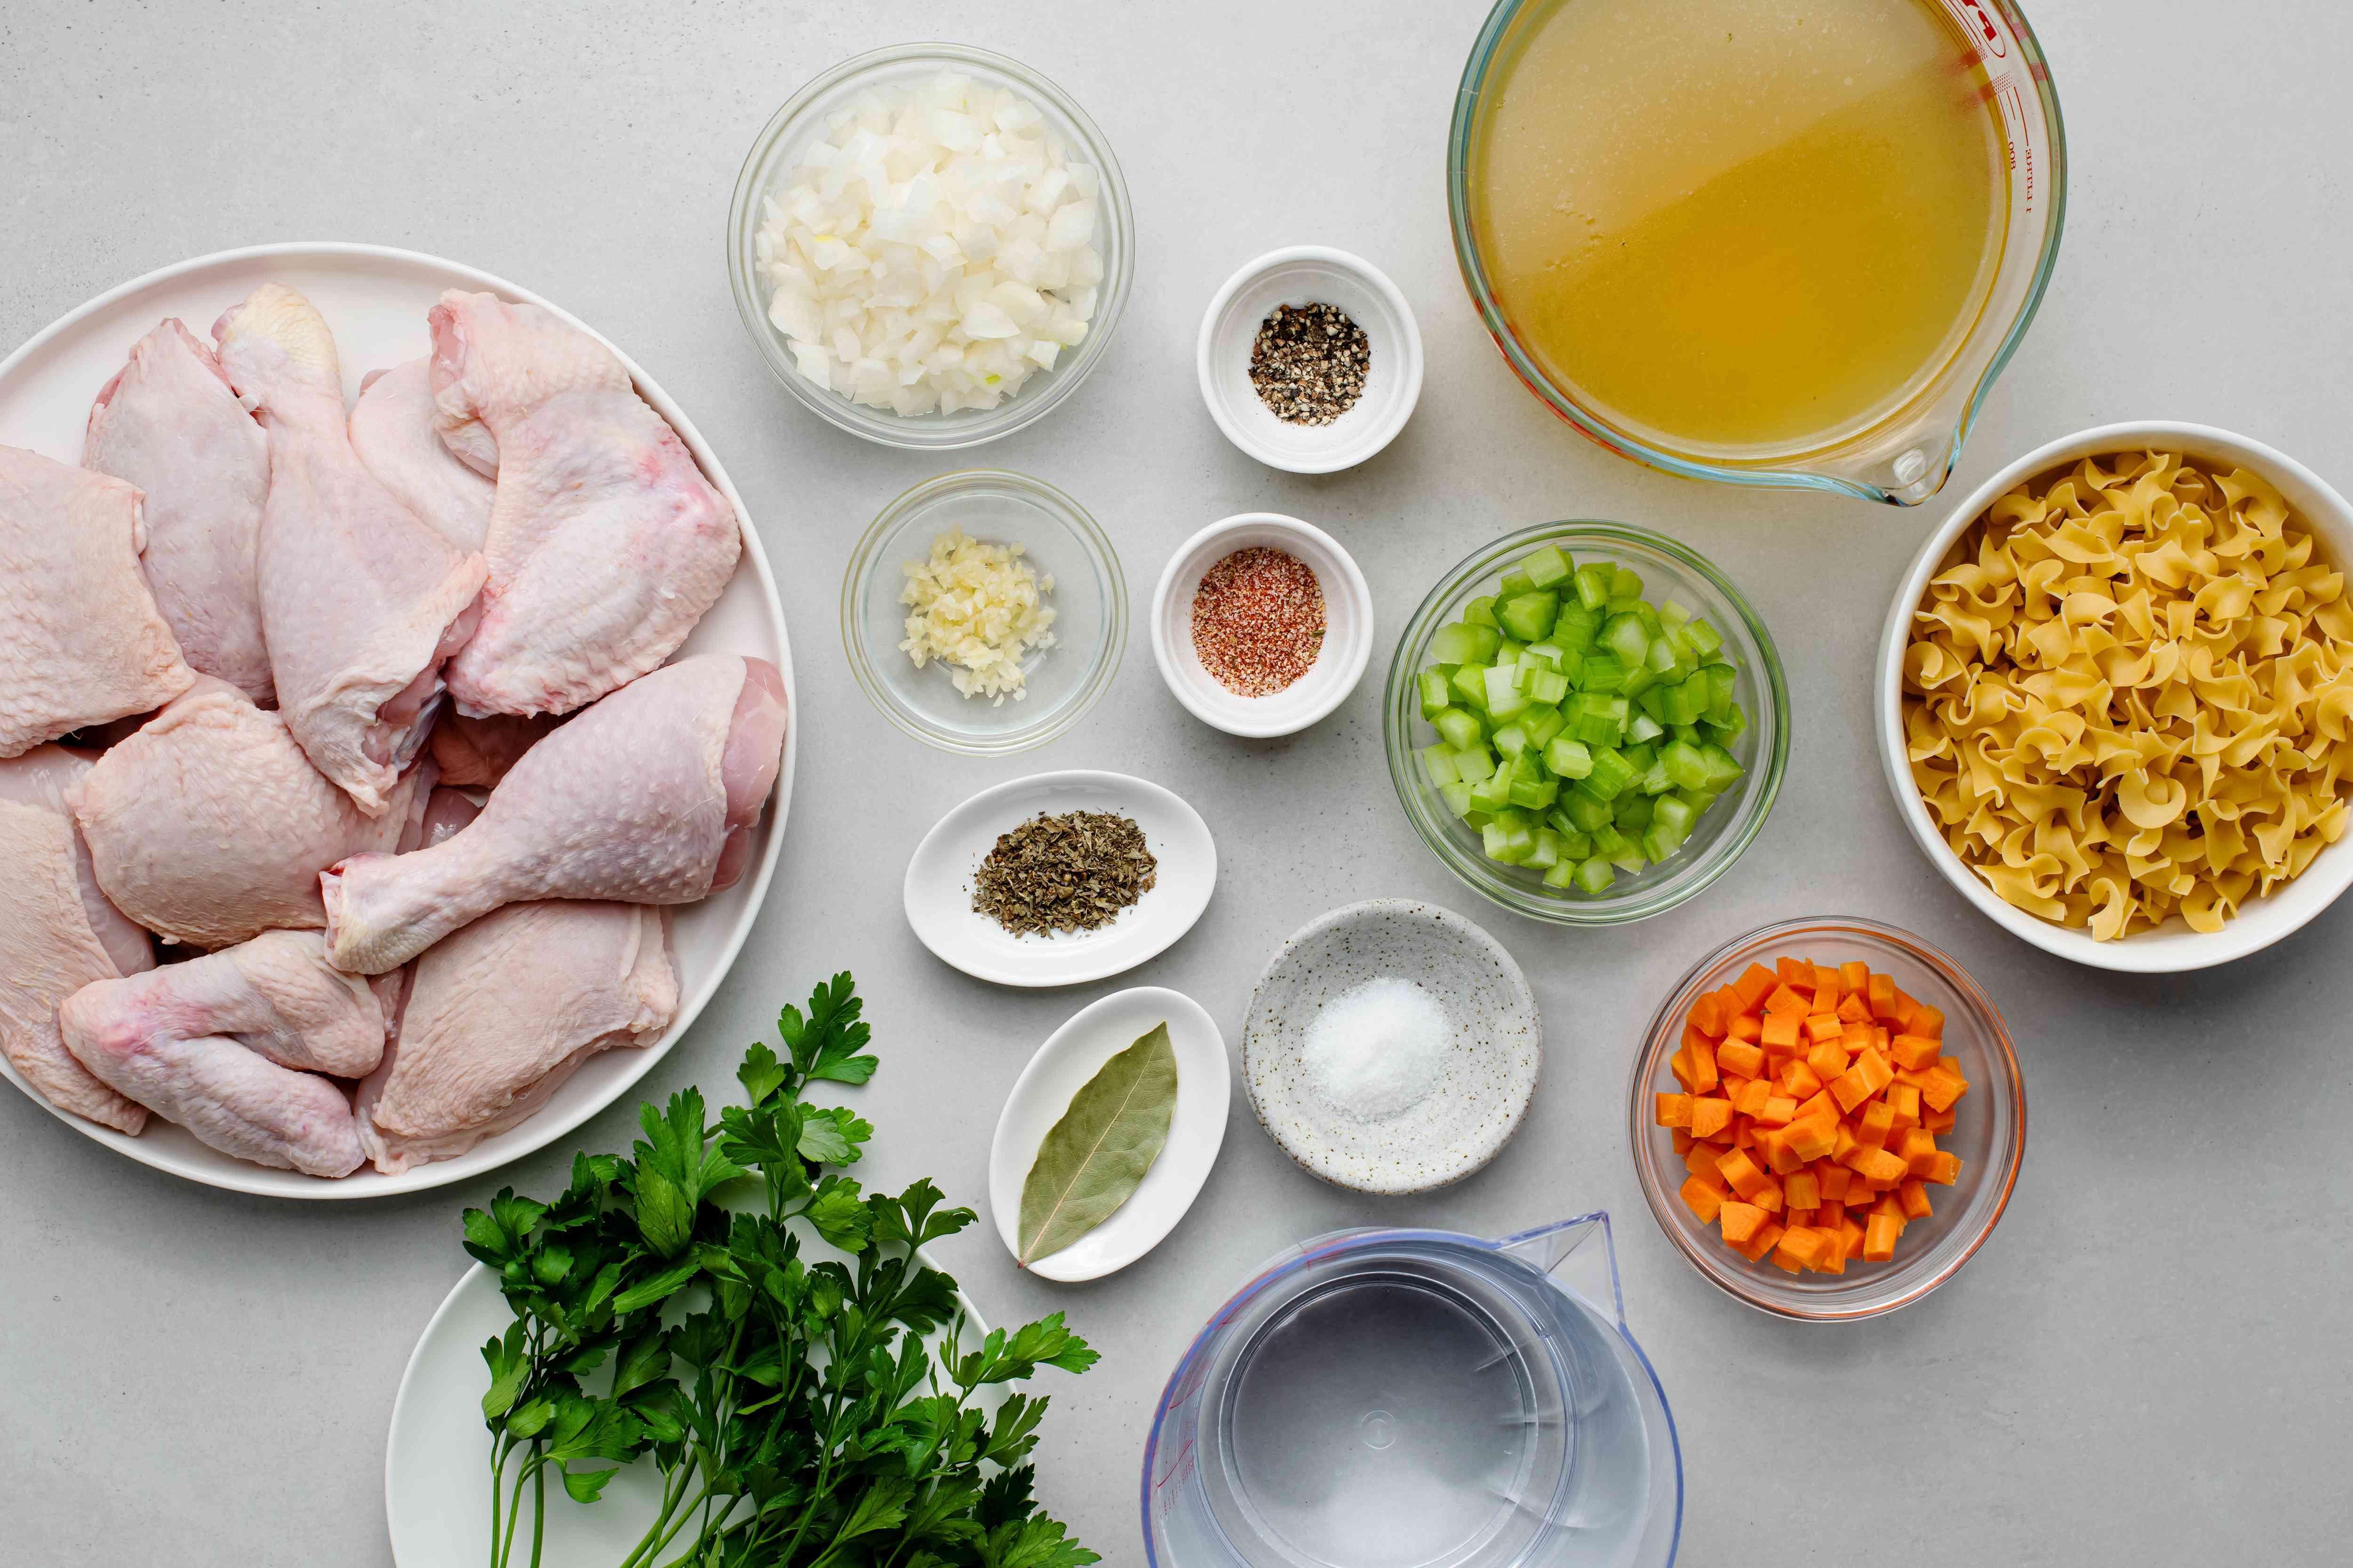 Crock Pot Chicken Noodle Soup ingredients